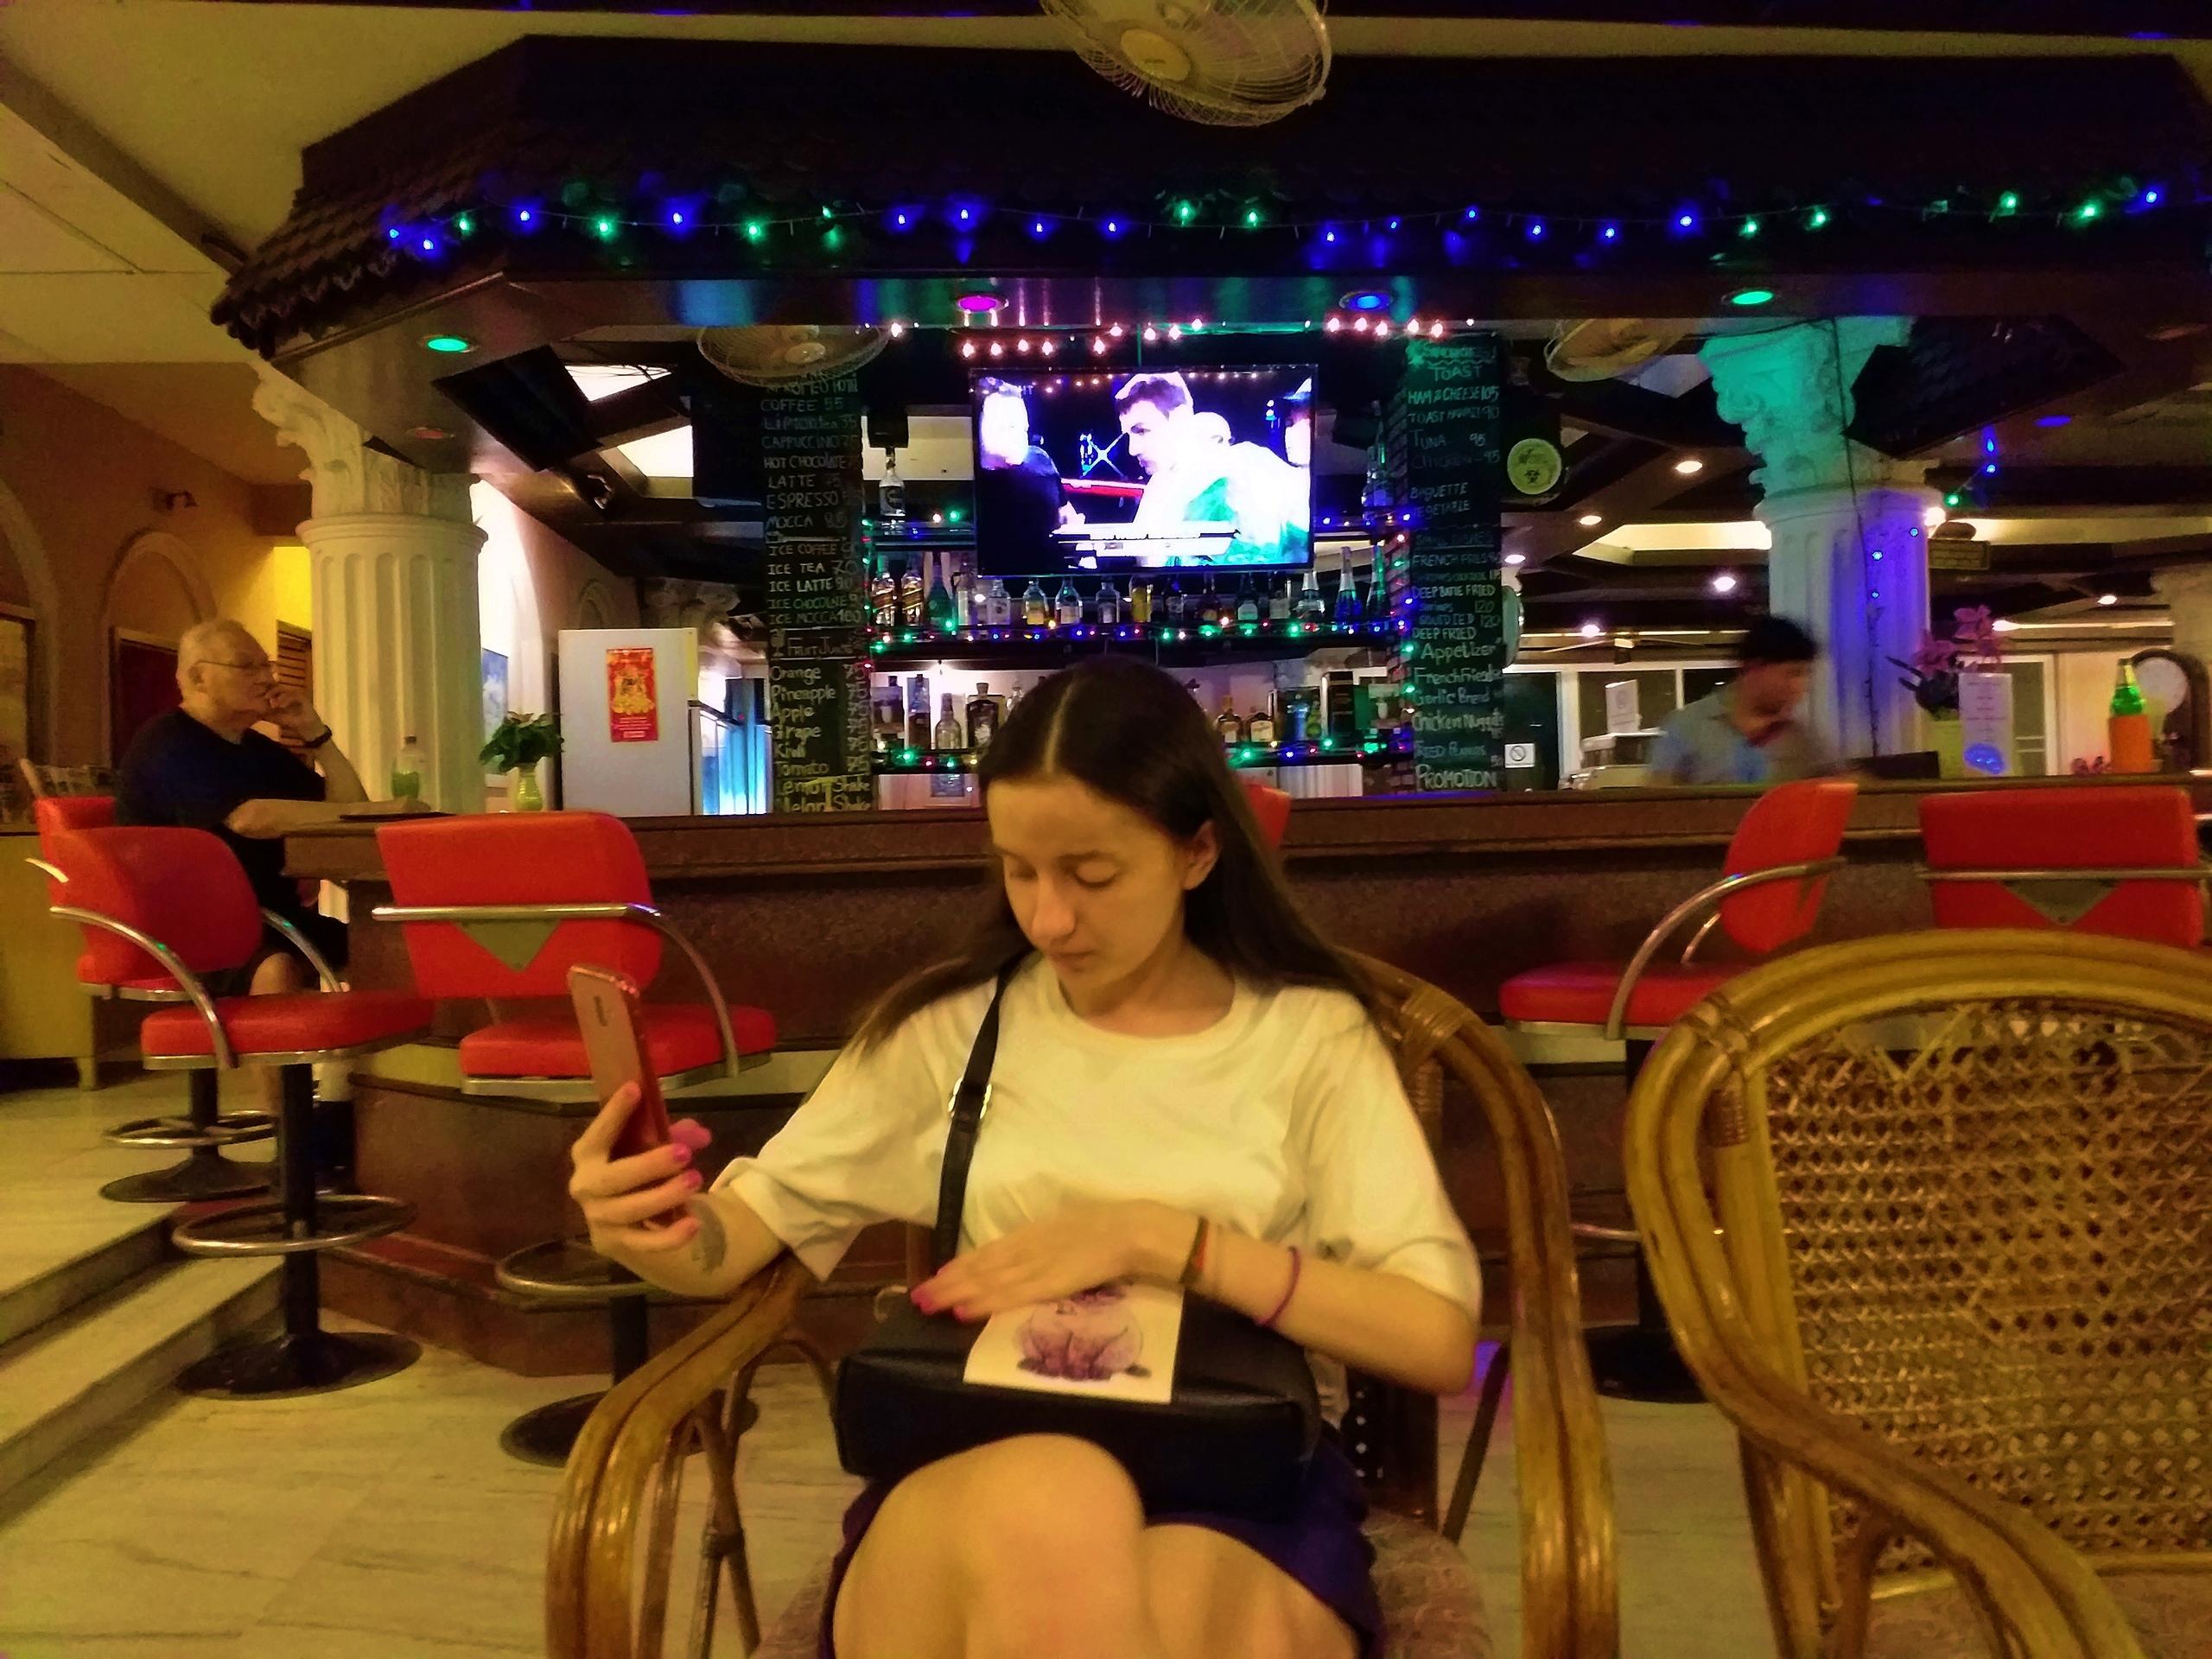 Елена Руденко (Валтея). Мои путешествия. Таиланд ( 2019 г. осень) ФОТО. Y3Fri8_WuNY